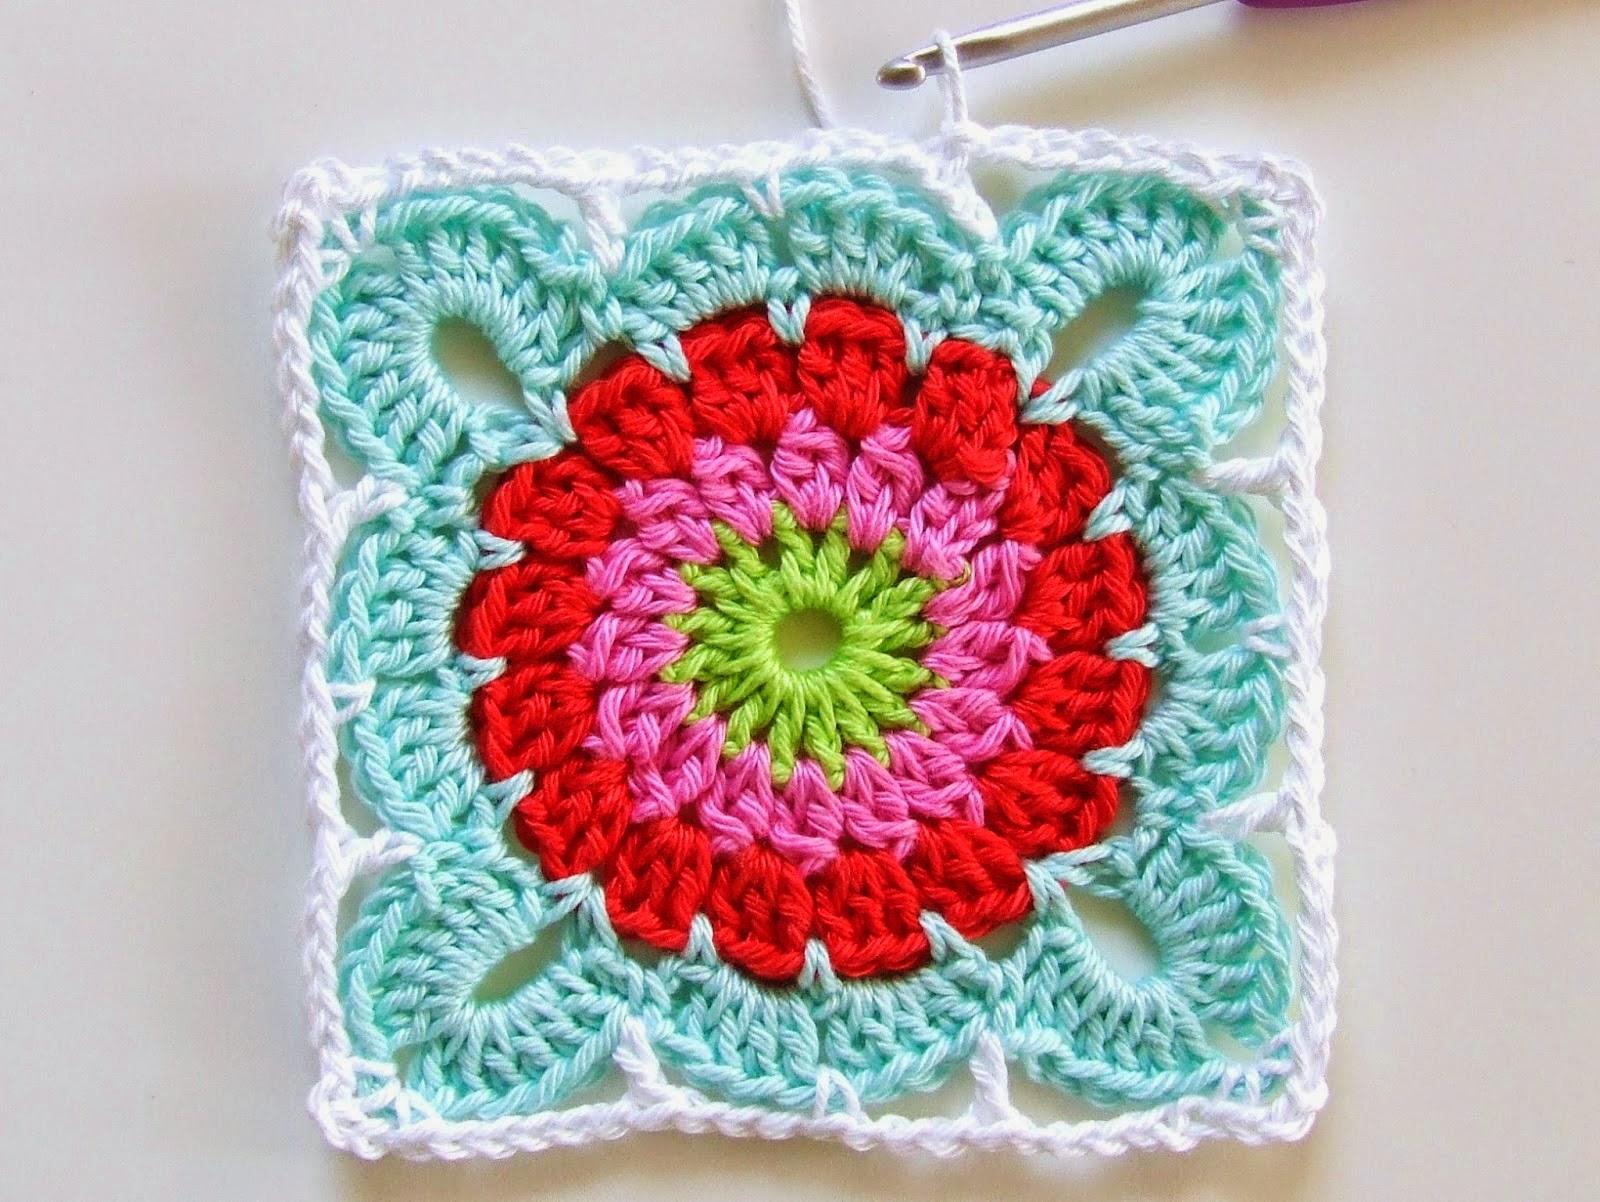 Mes Favoris Tricot Crochet Tuto Crochet Un Joli Carre